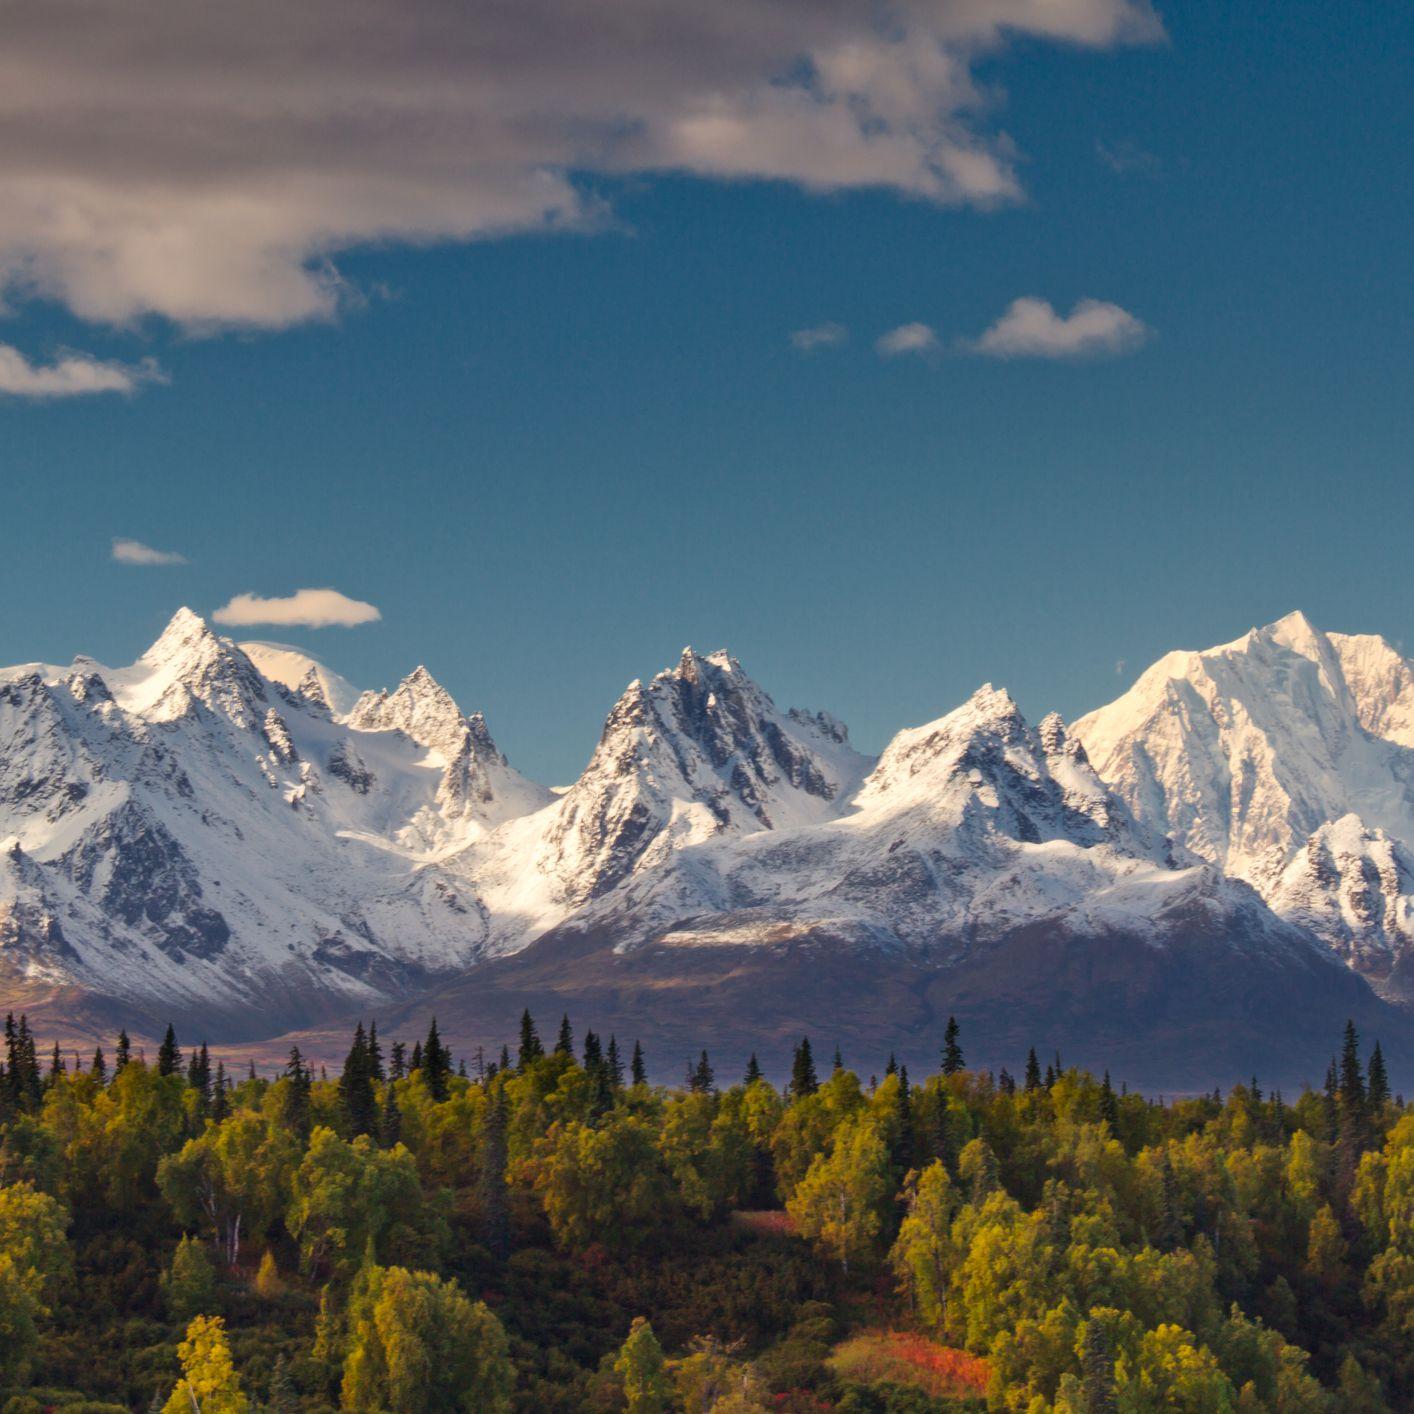 National Parks & Public Lands Legacy - cover